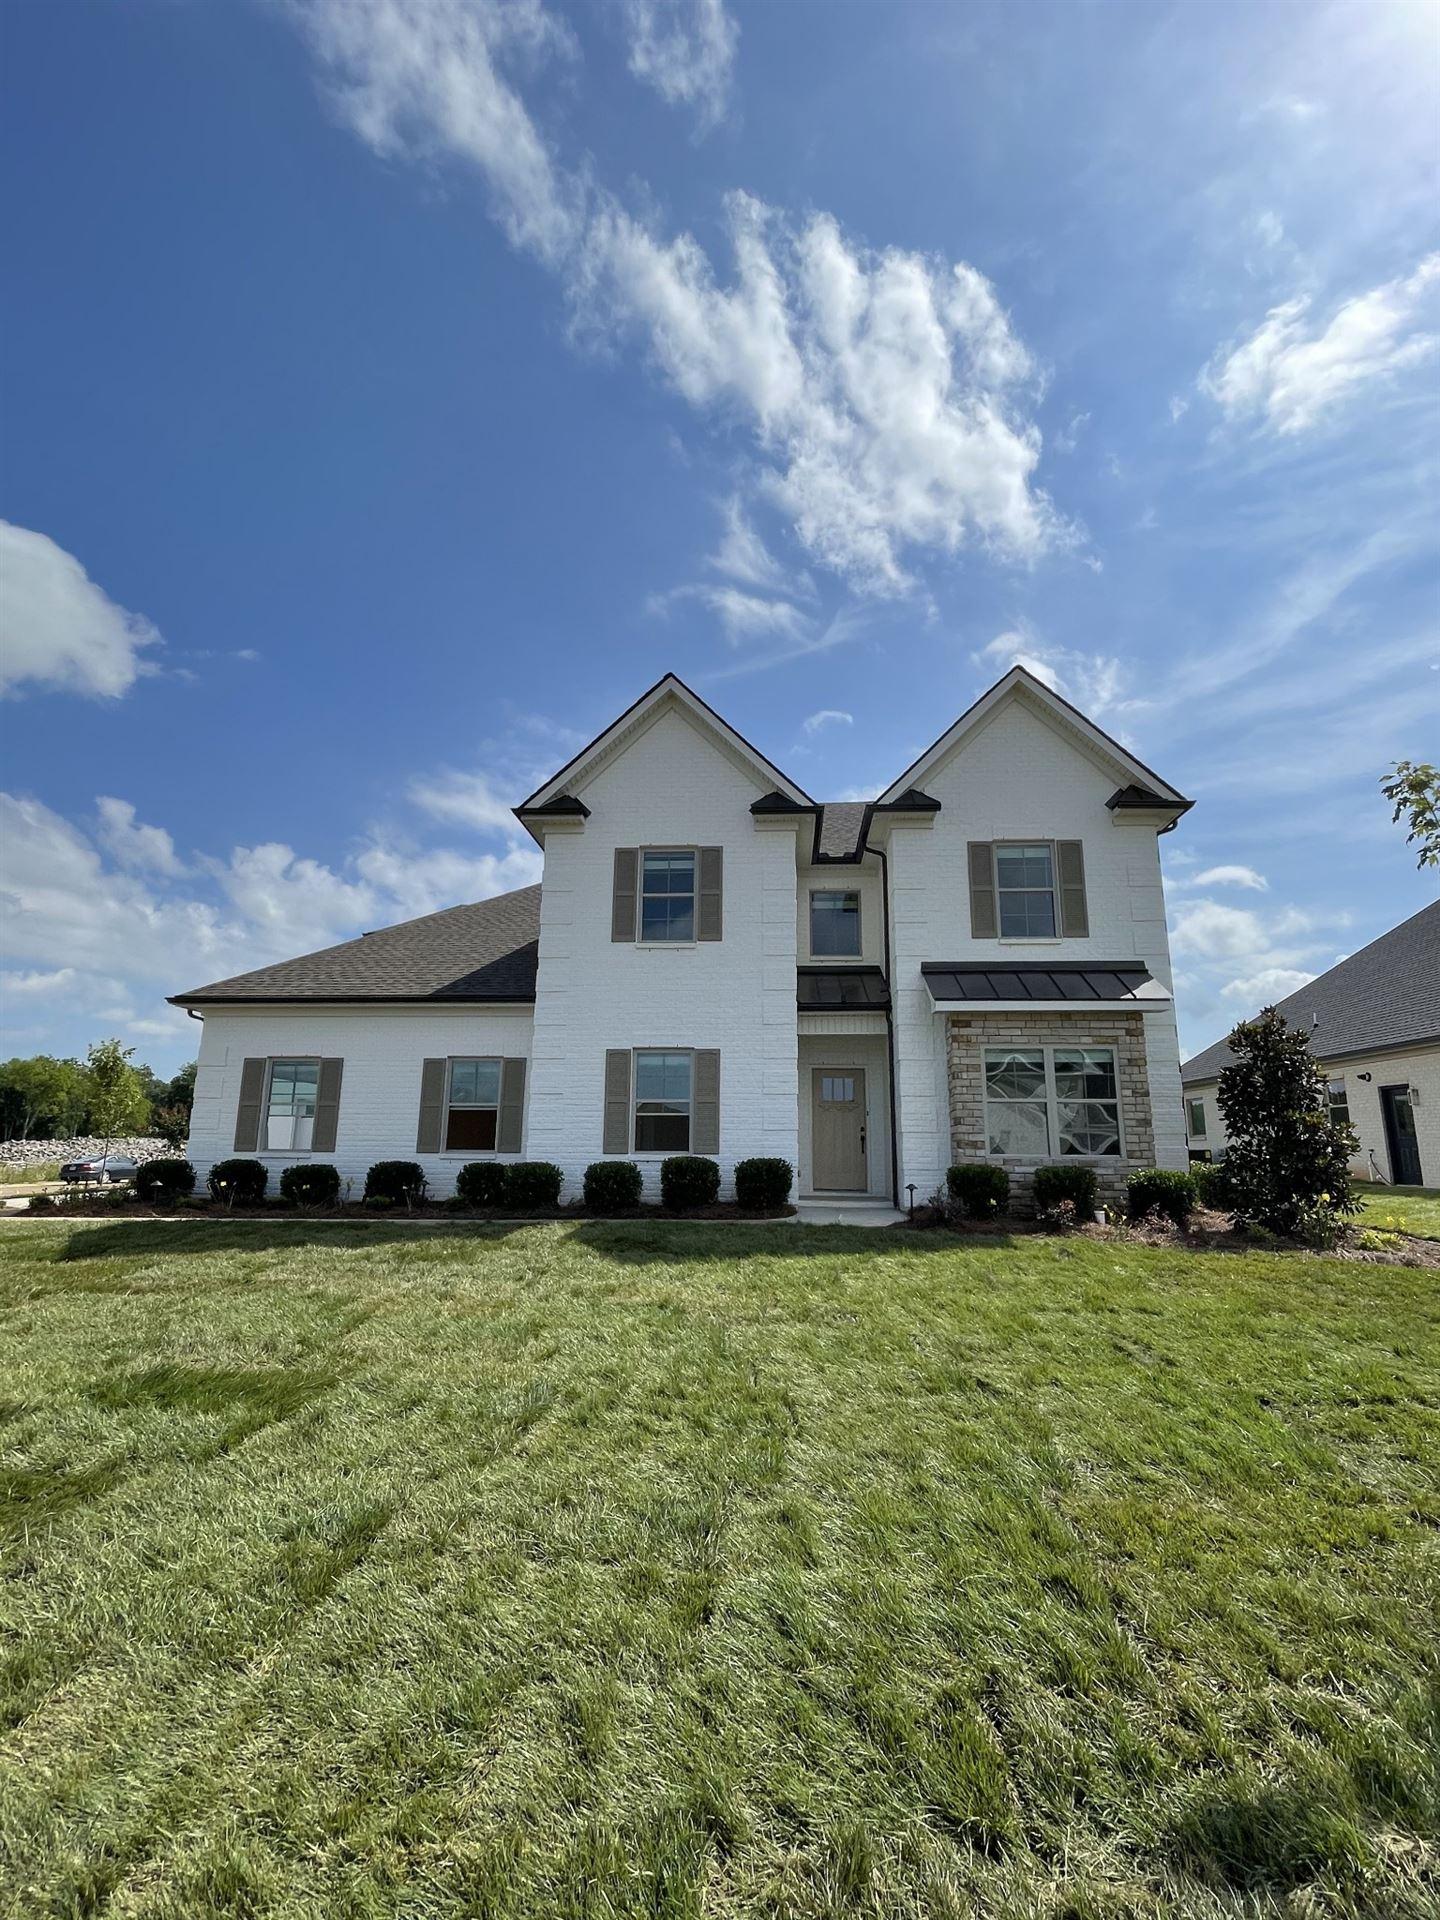 5719 Mendenhall Way (Lot 132), Murfreesboro, TN 37127 - MLS#: 2260998